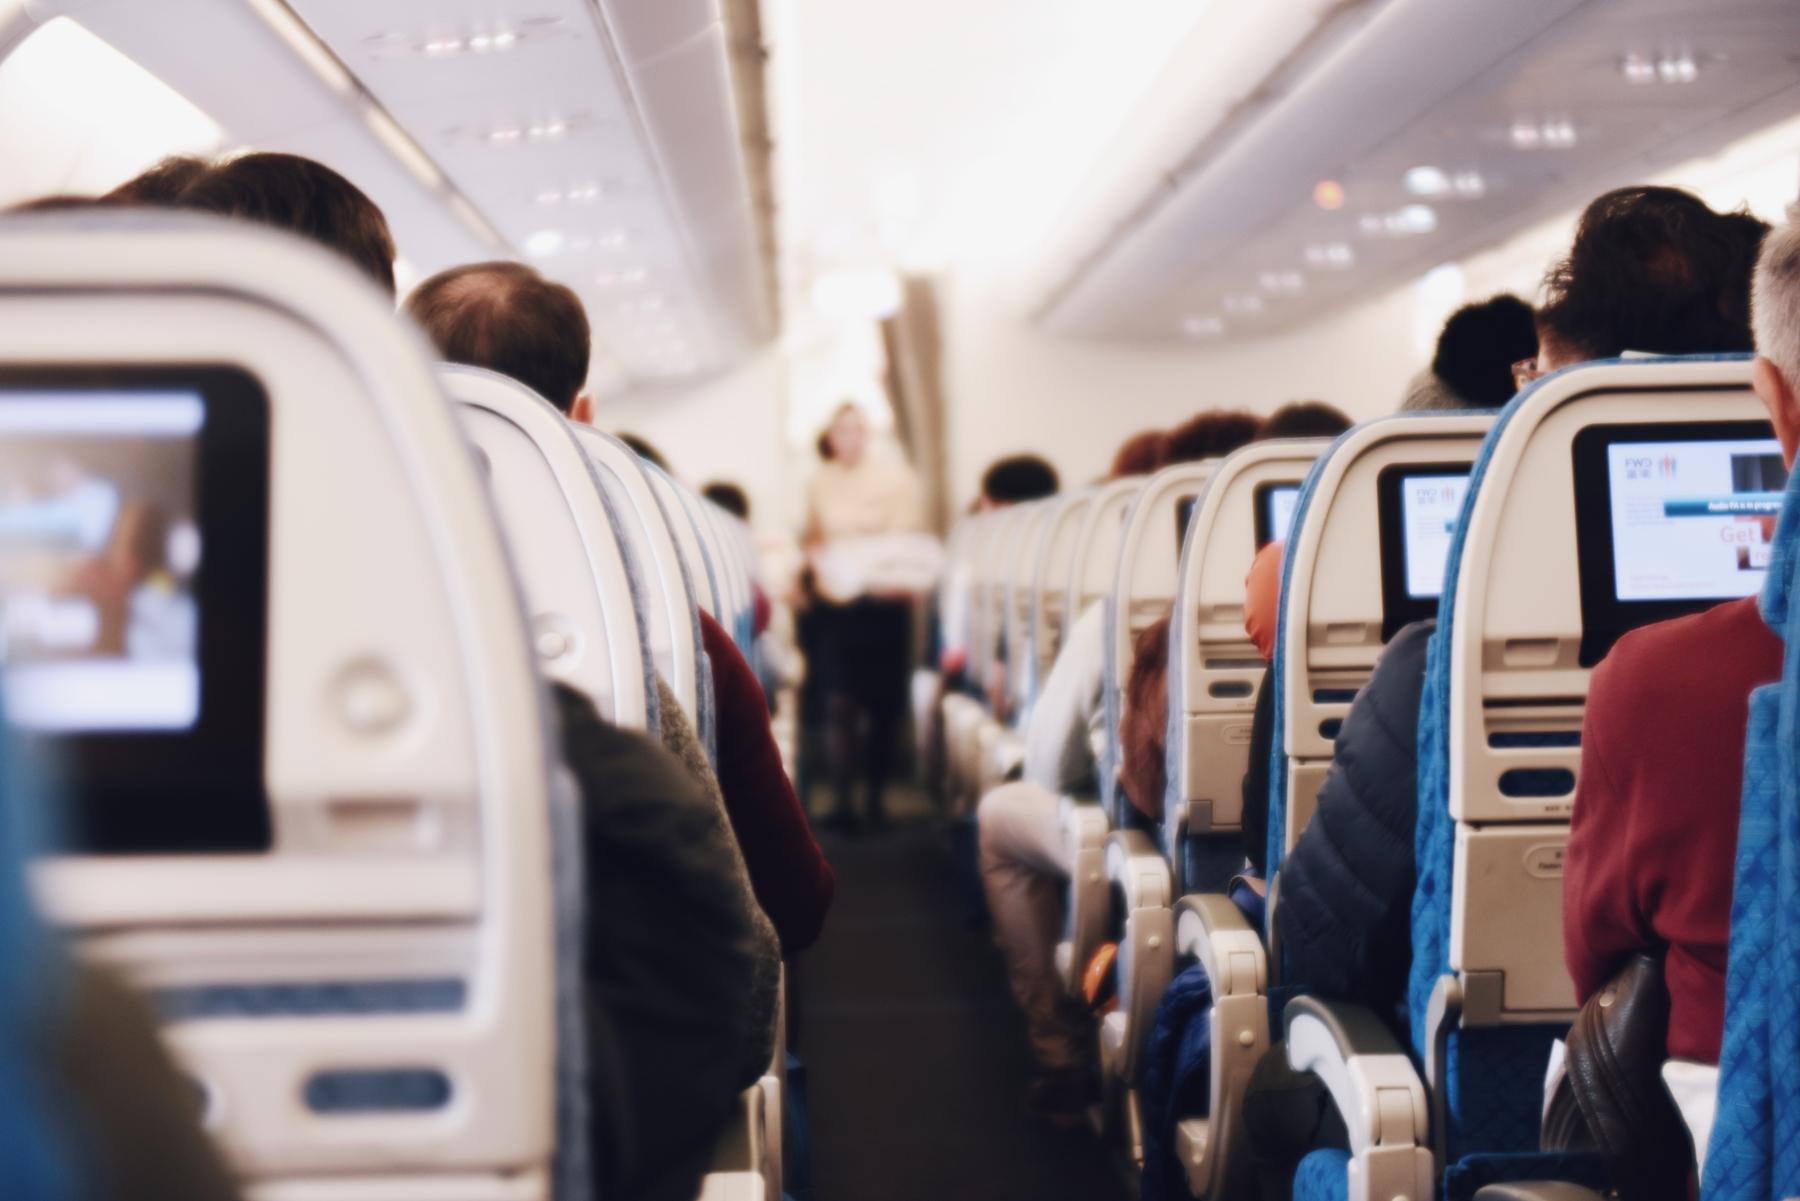 An air steward hands out snacks in an airplane cabin.